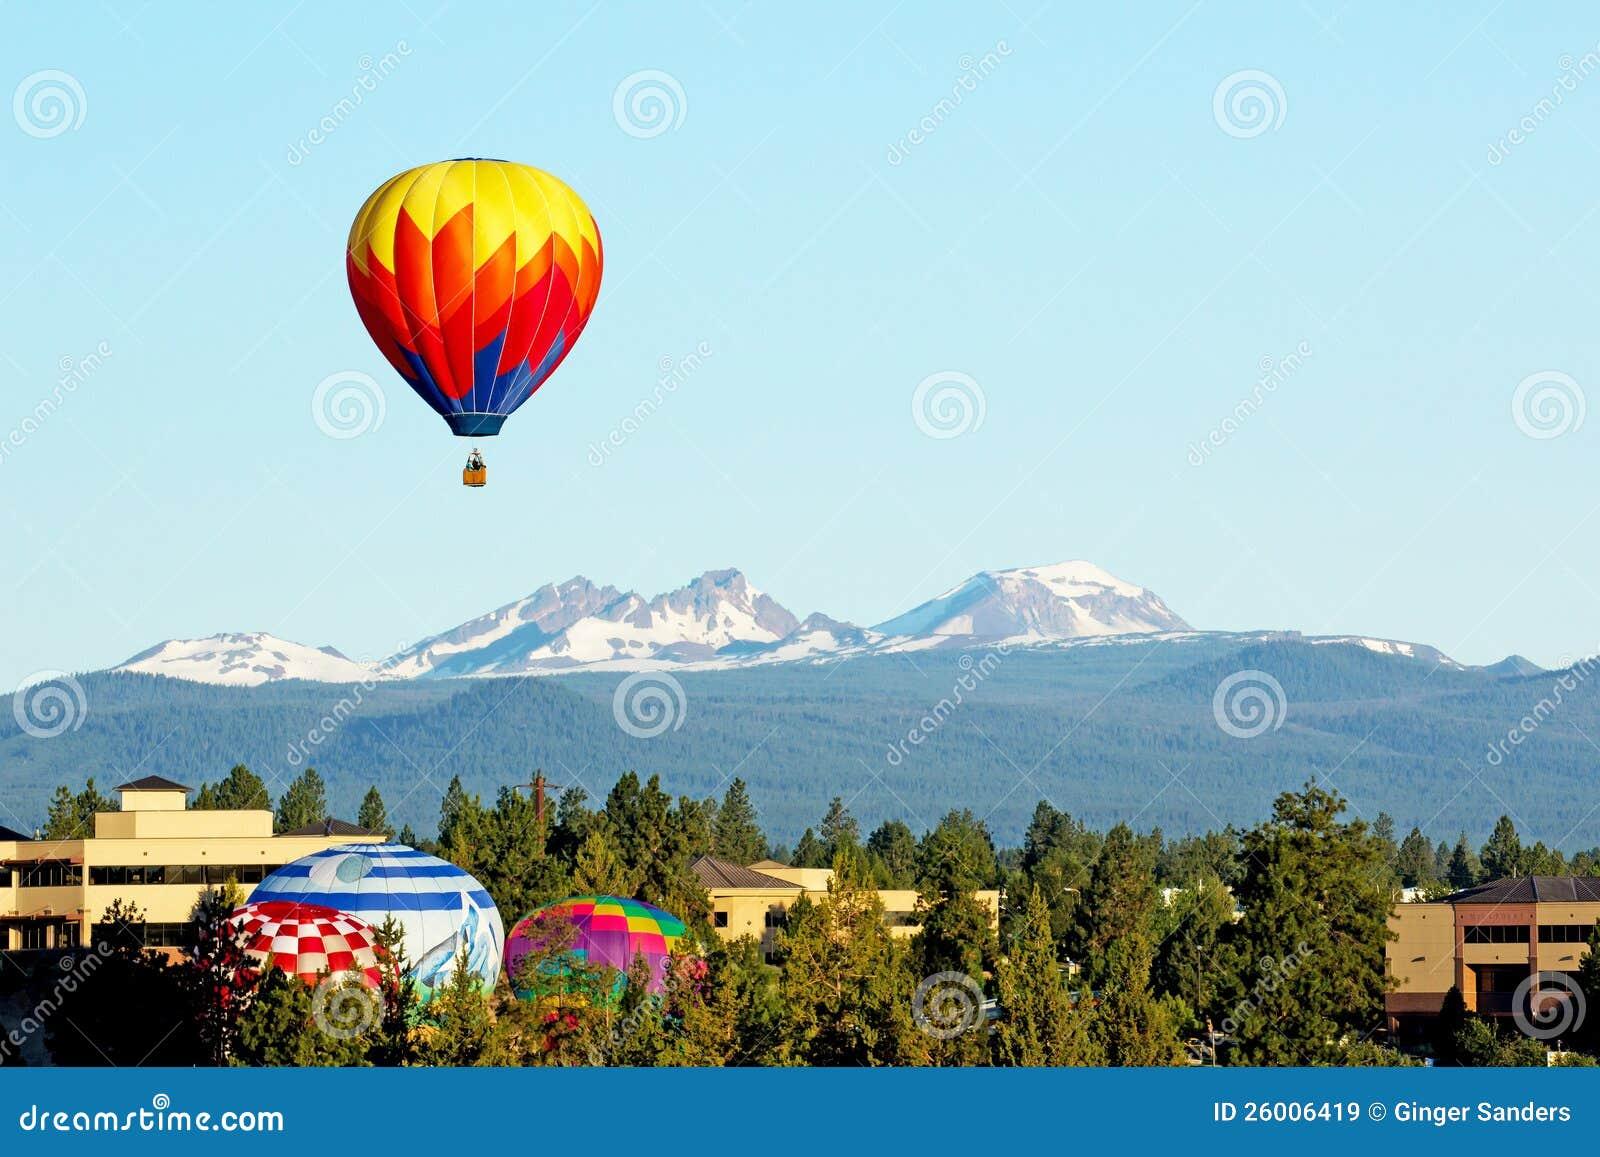 Hot Air Balloon Launch In Oregon